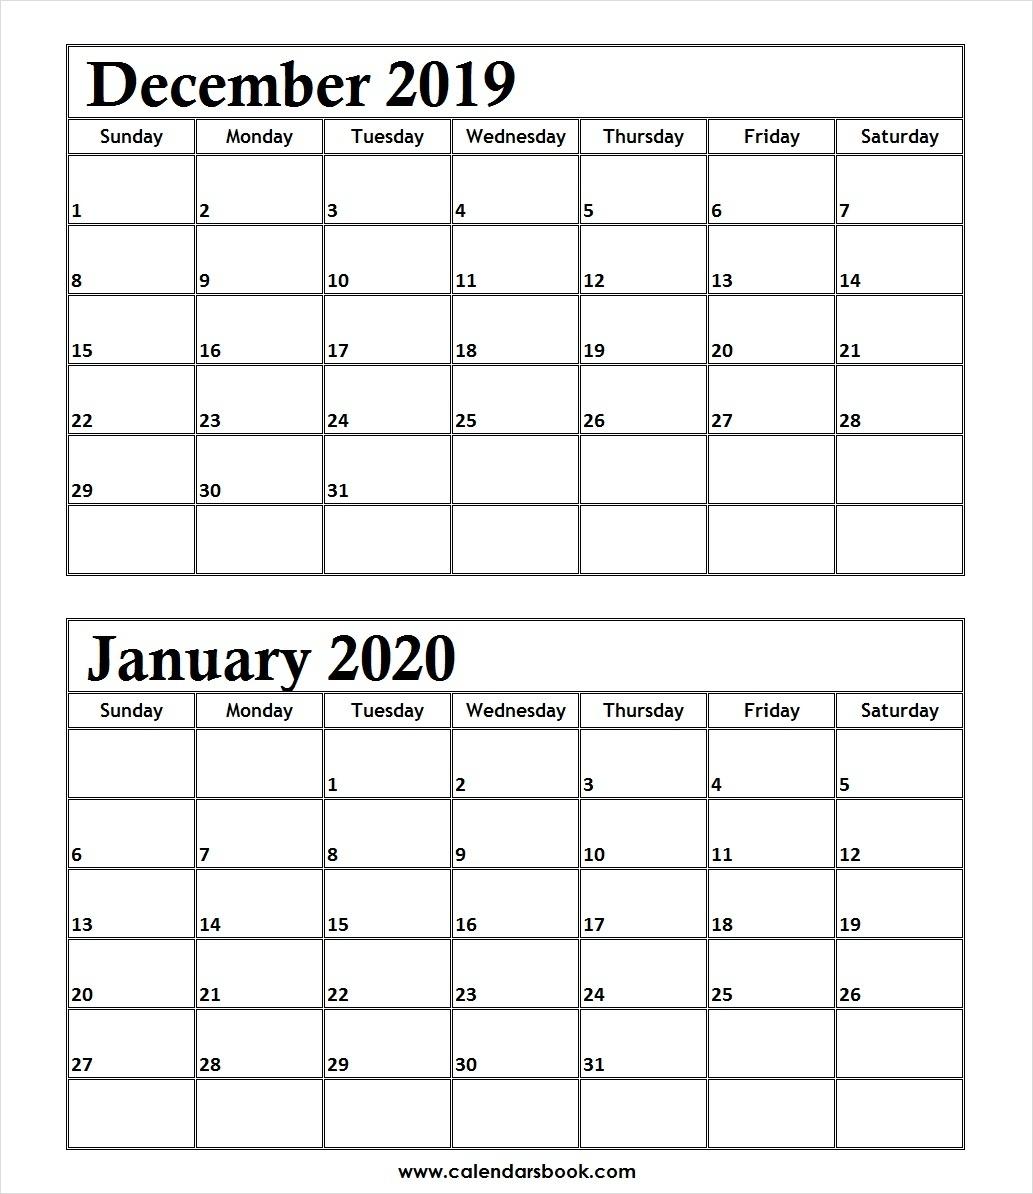 Printable Calendar December 2019 And January 2020 | Calendar